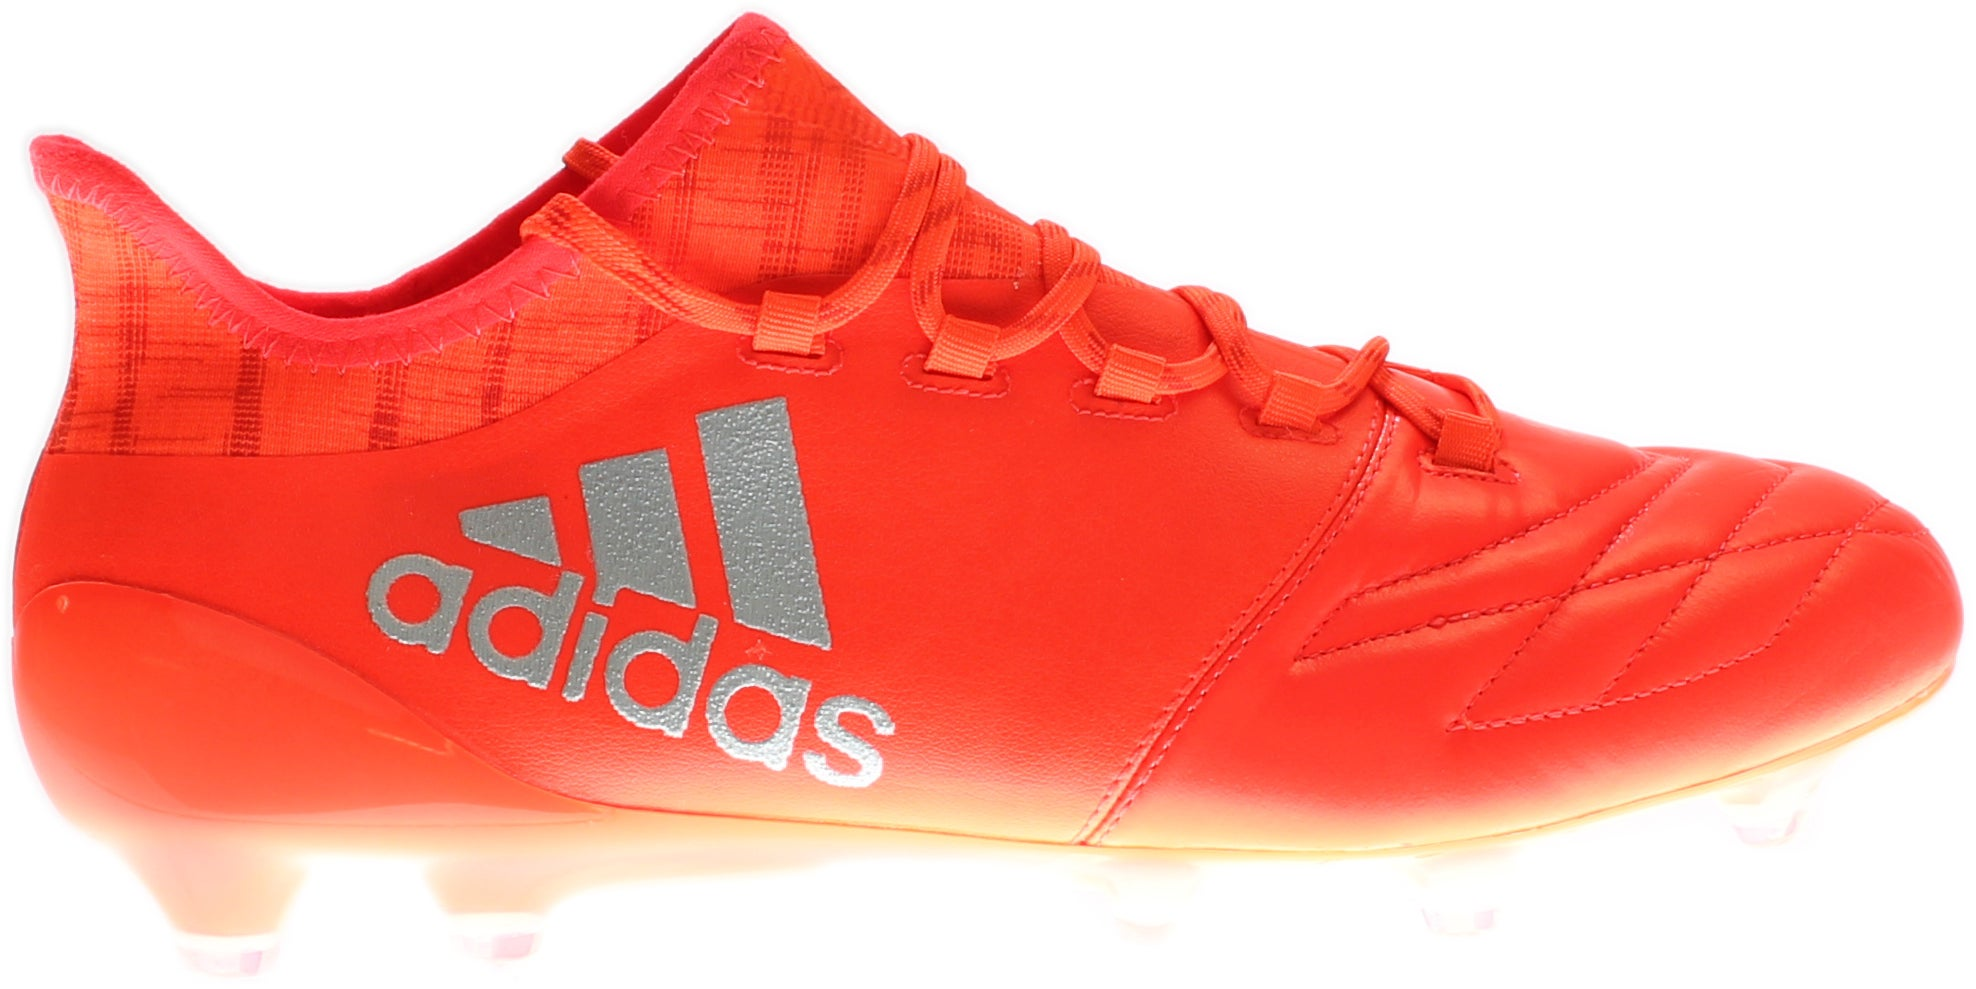 adidas X 16.1 FG Leather Orange;Red - Mens  - Size 6.5